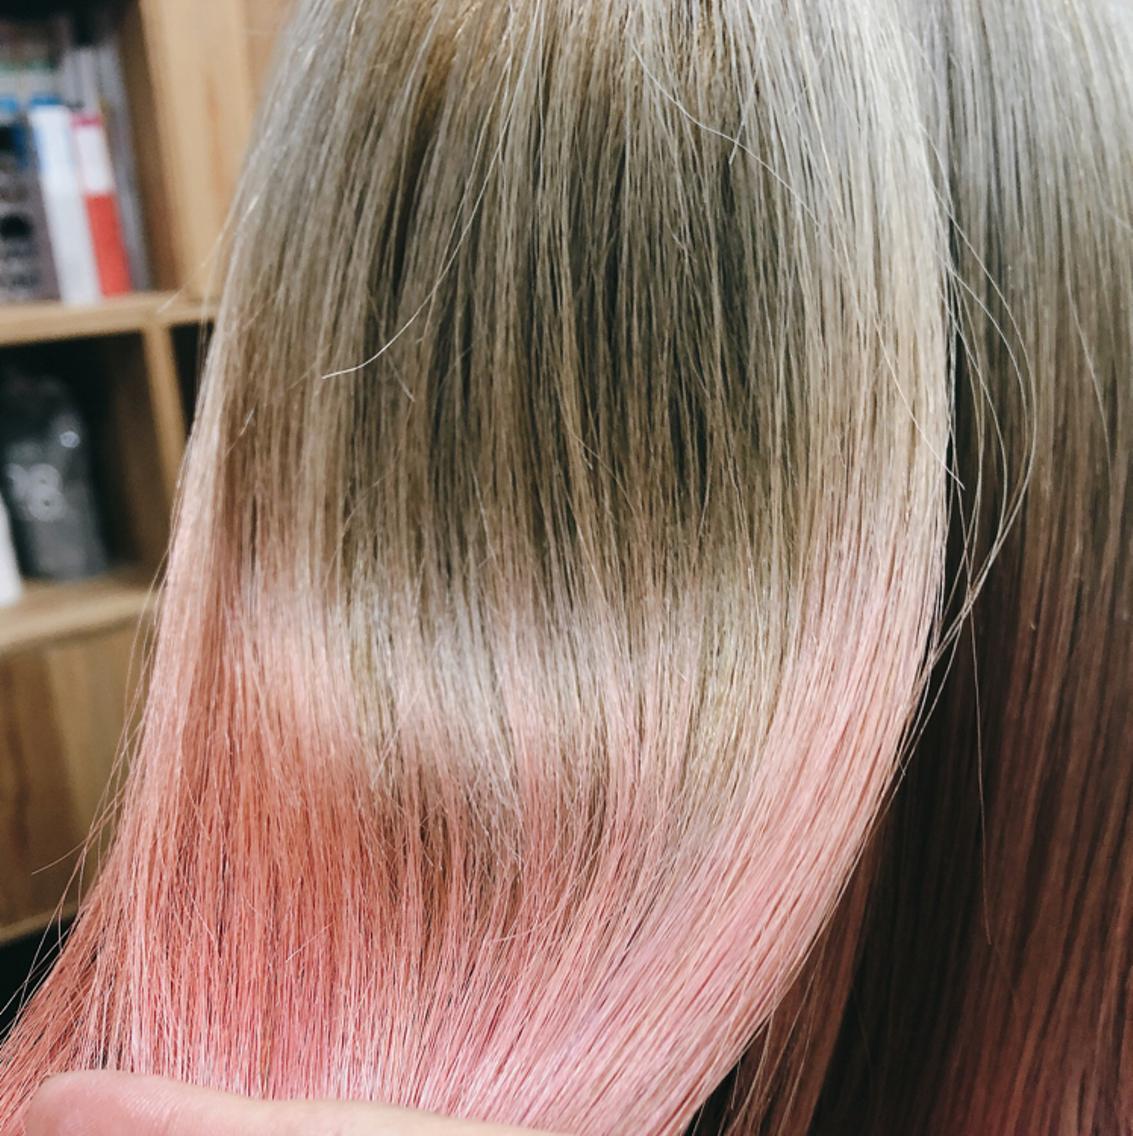 Lanai hair所属・オーナー渡邉hiromiの掲載